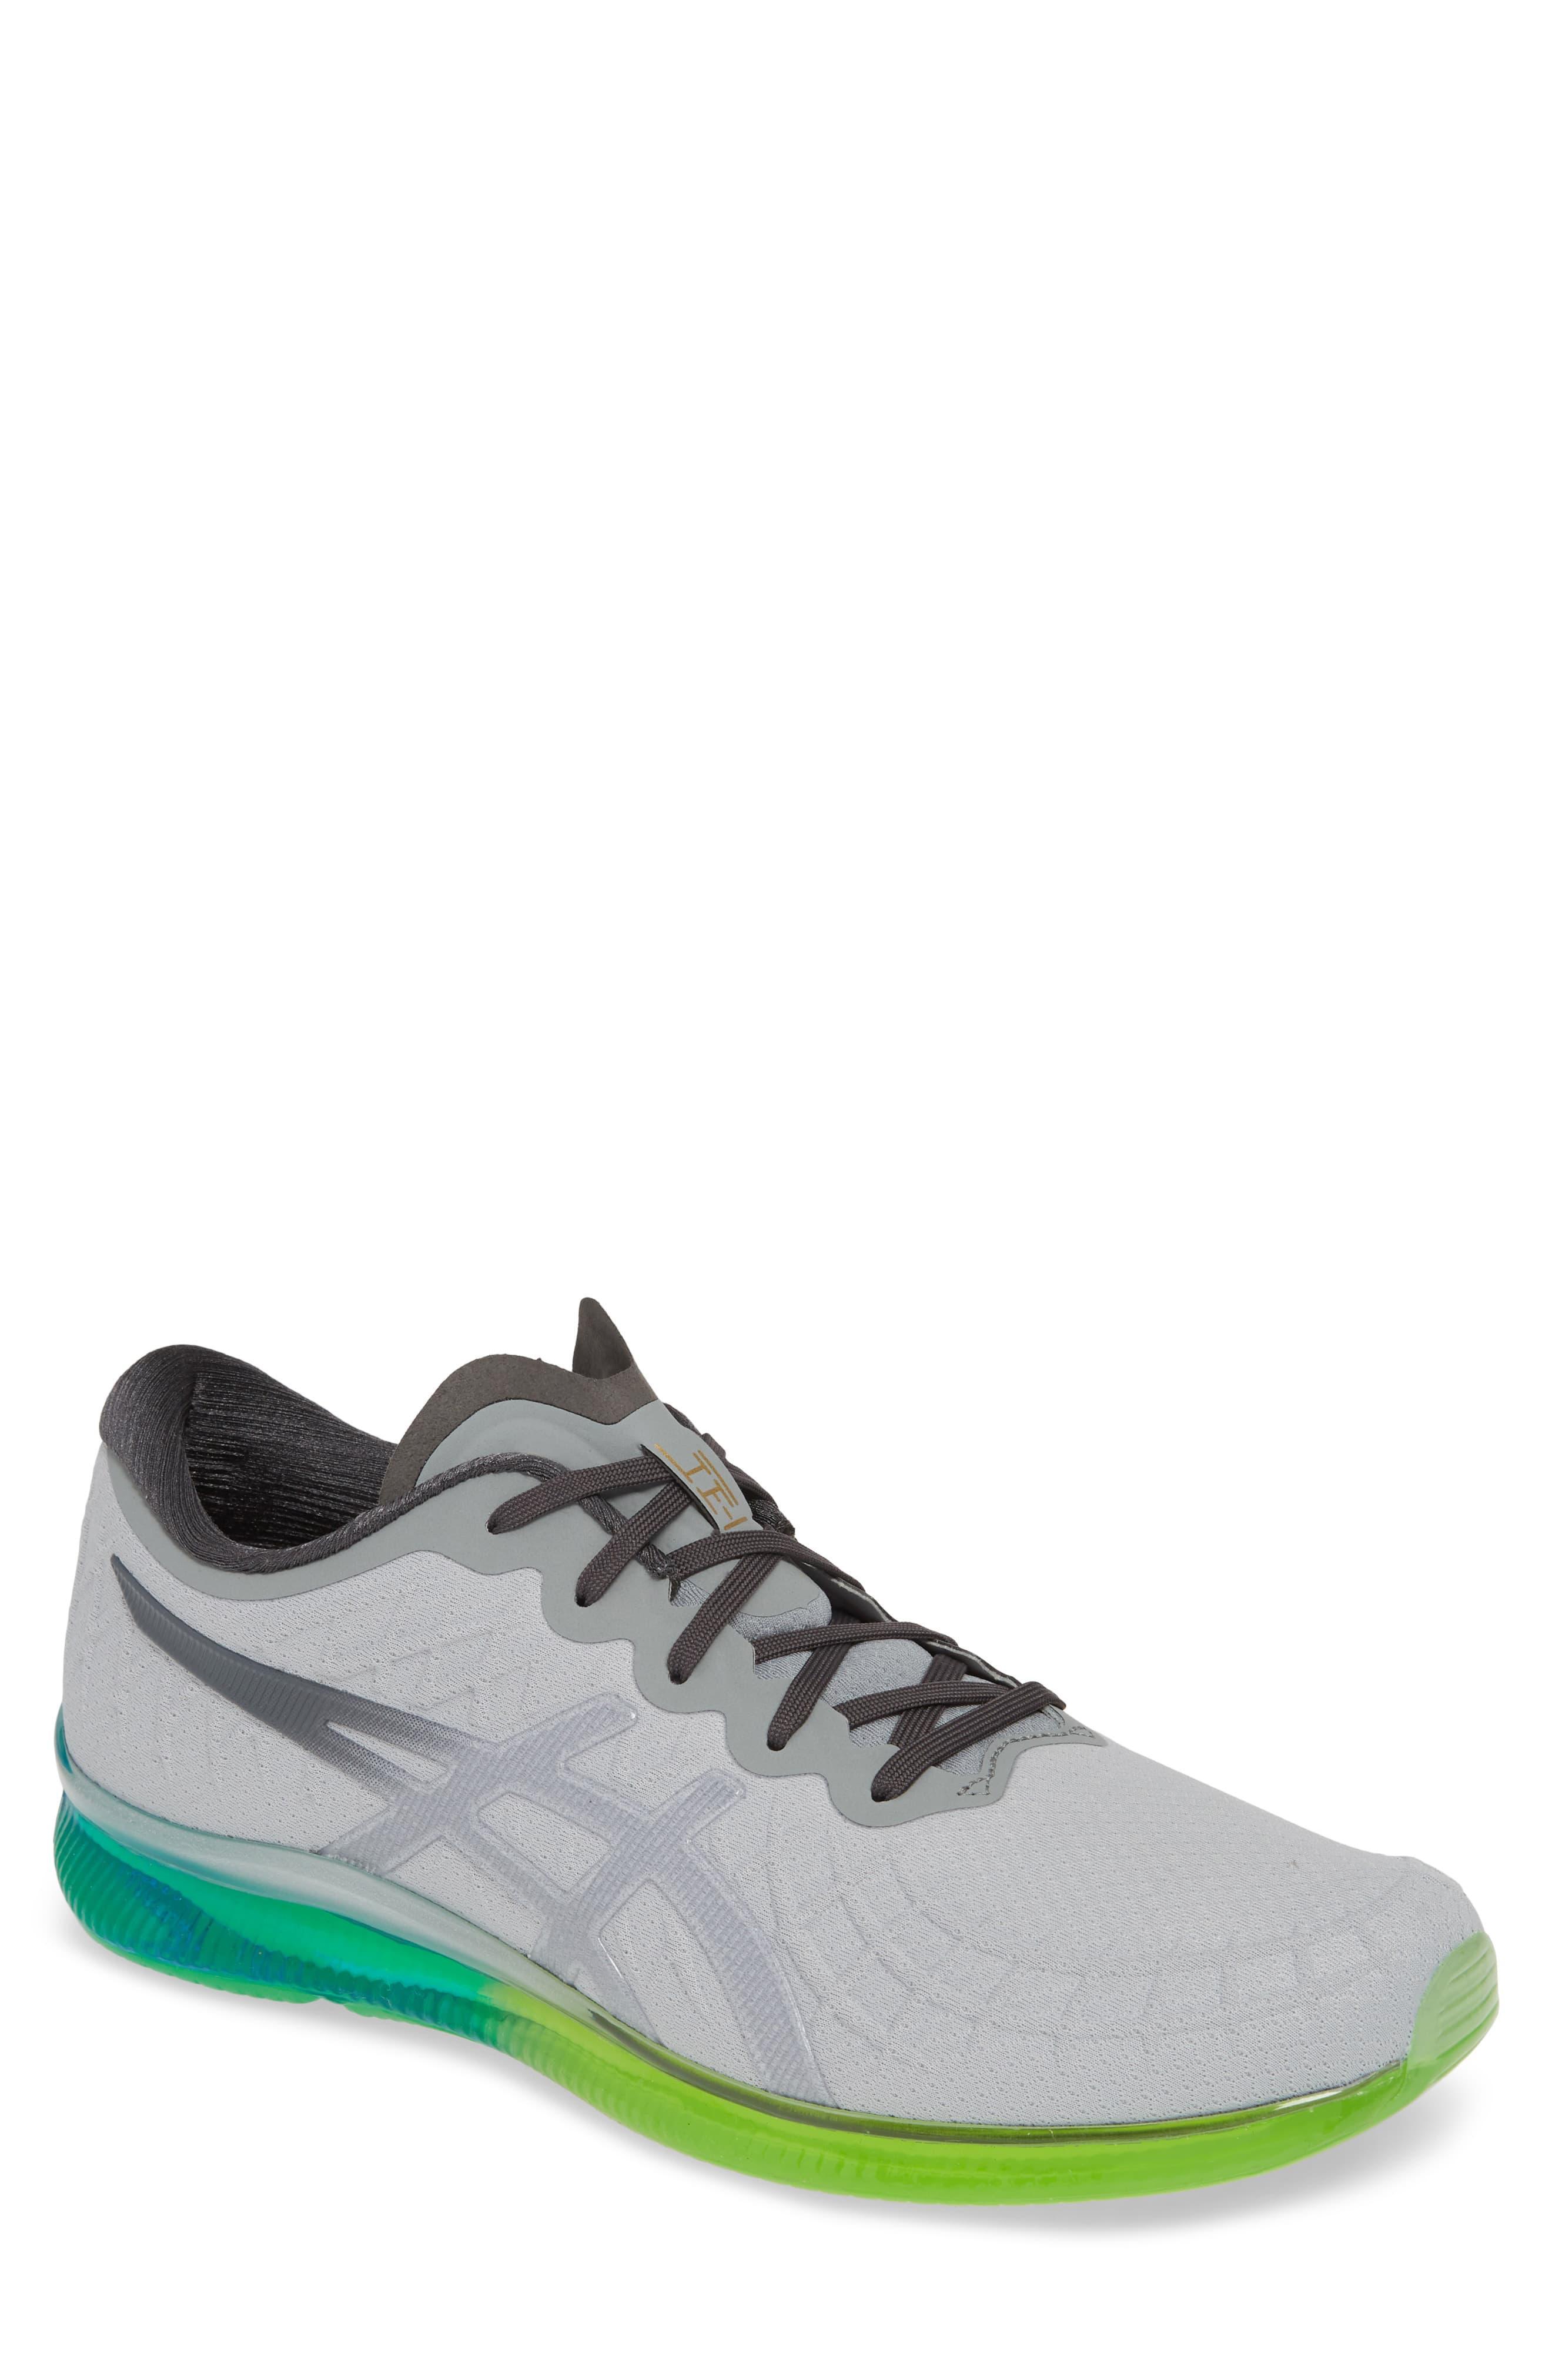 asics junior running shoes sale nordstrom